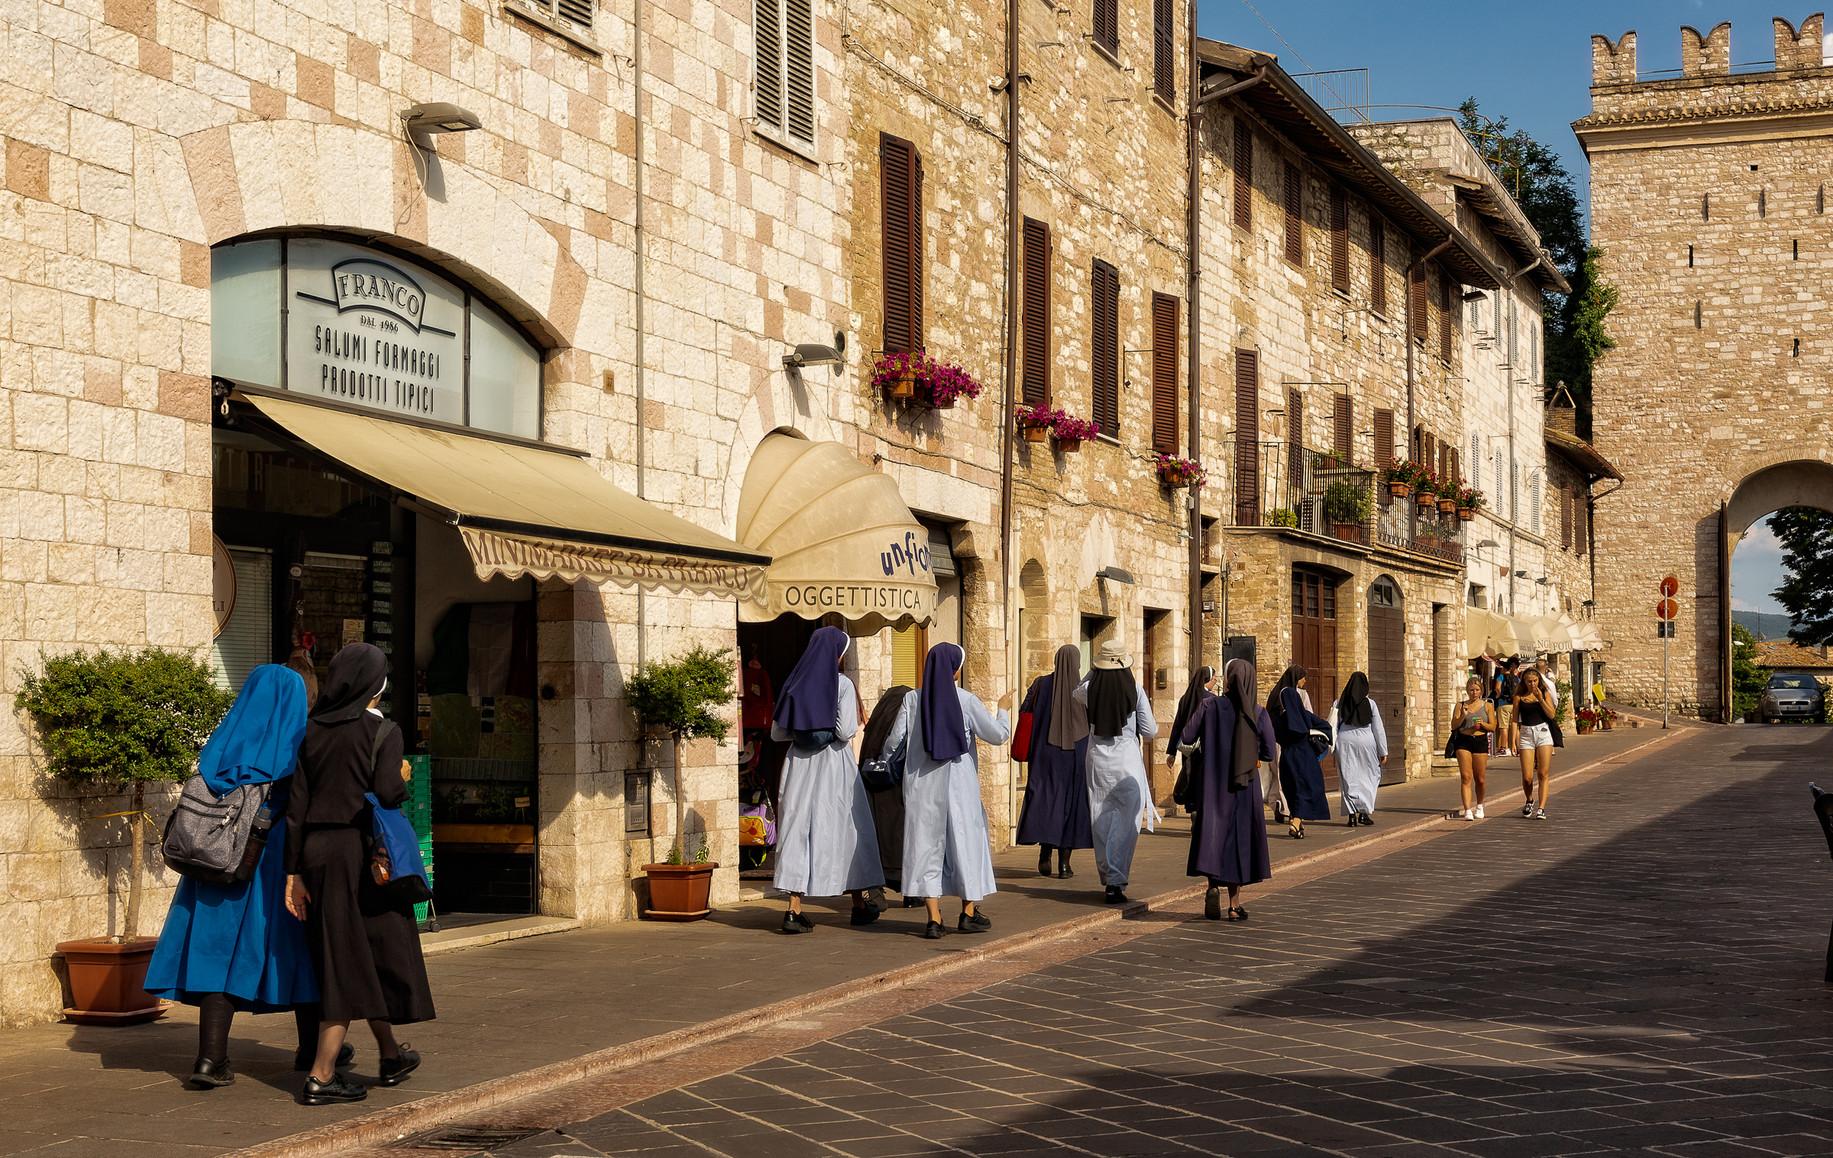 Kolleksjon-Assisi 2018-2-Maria egeland